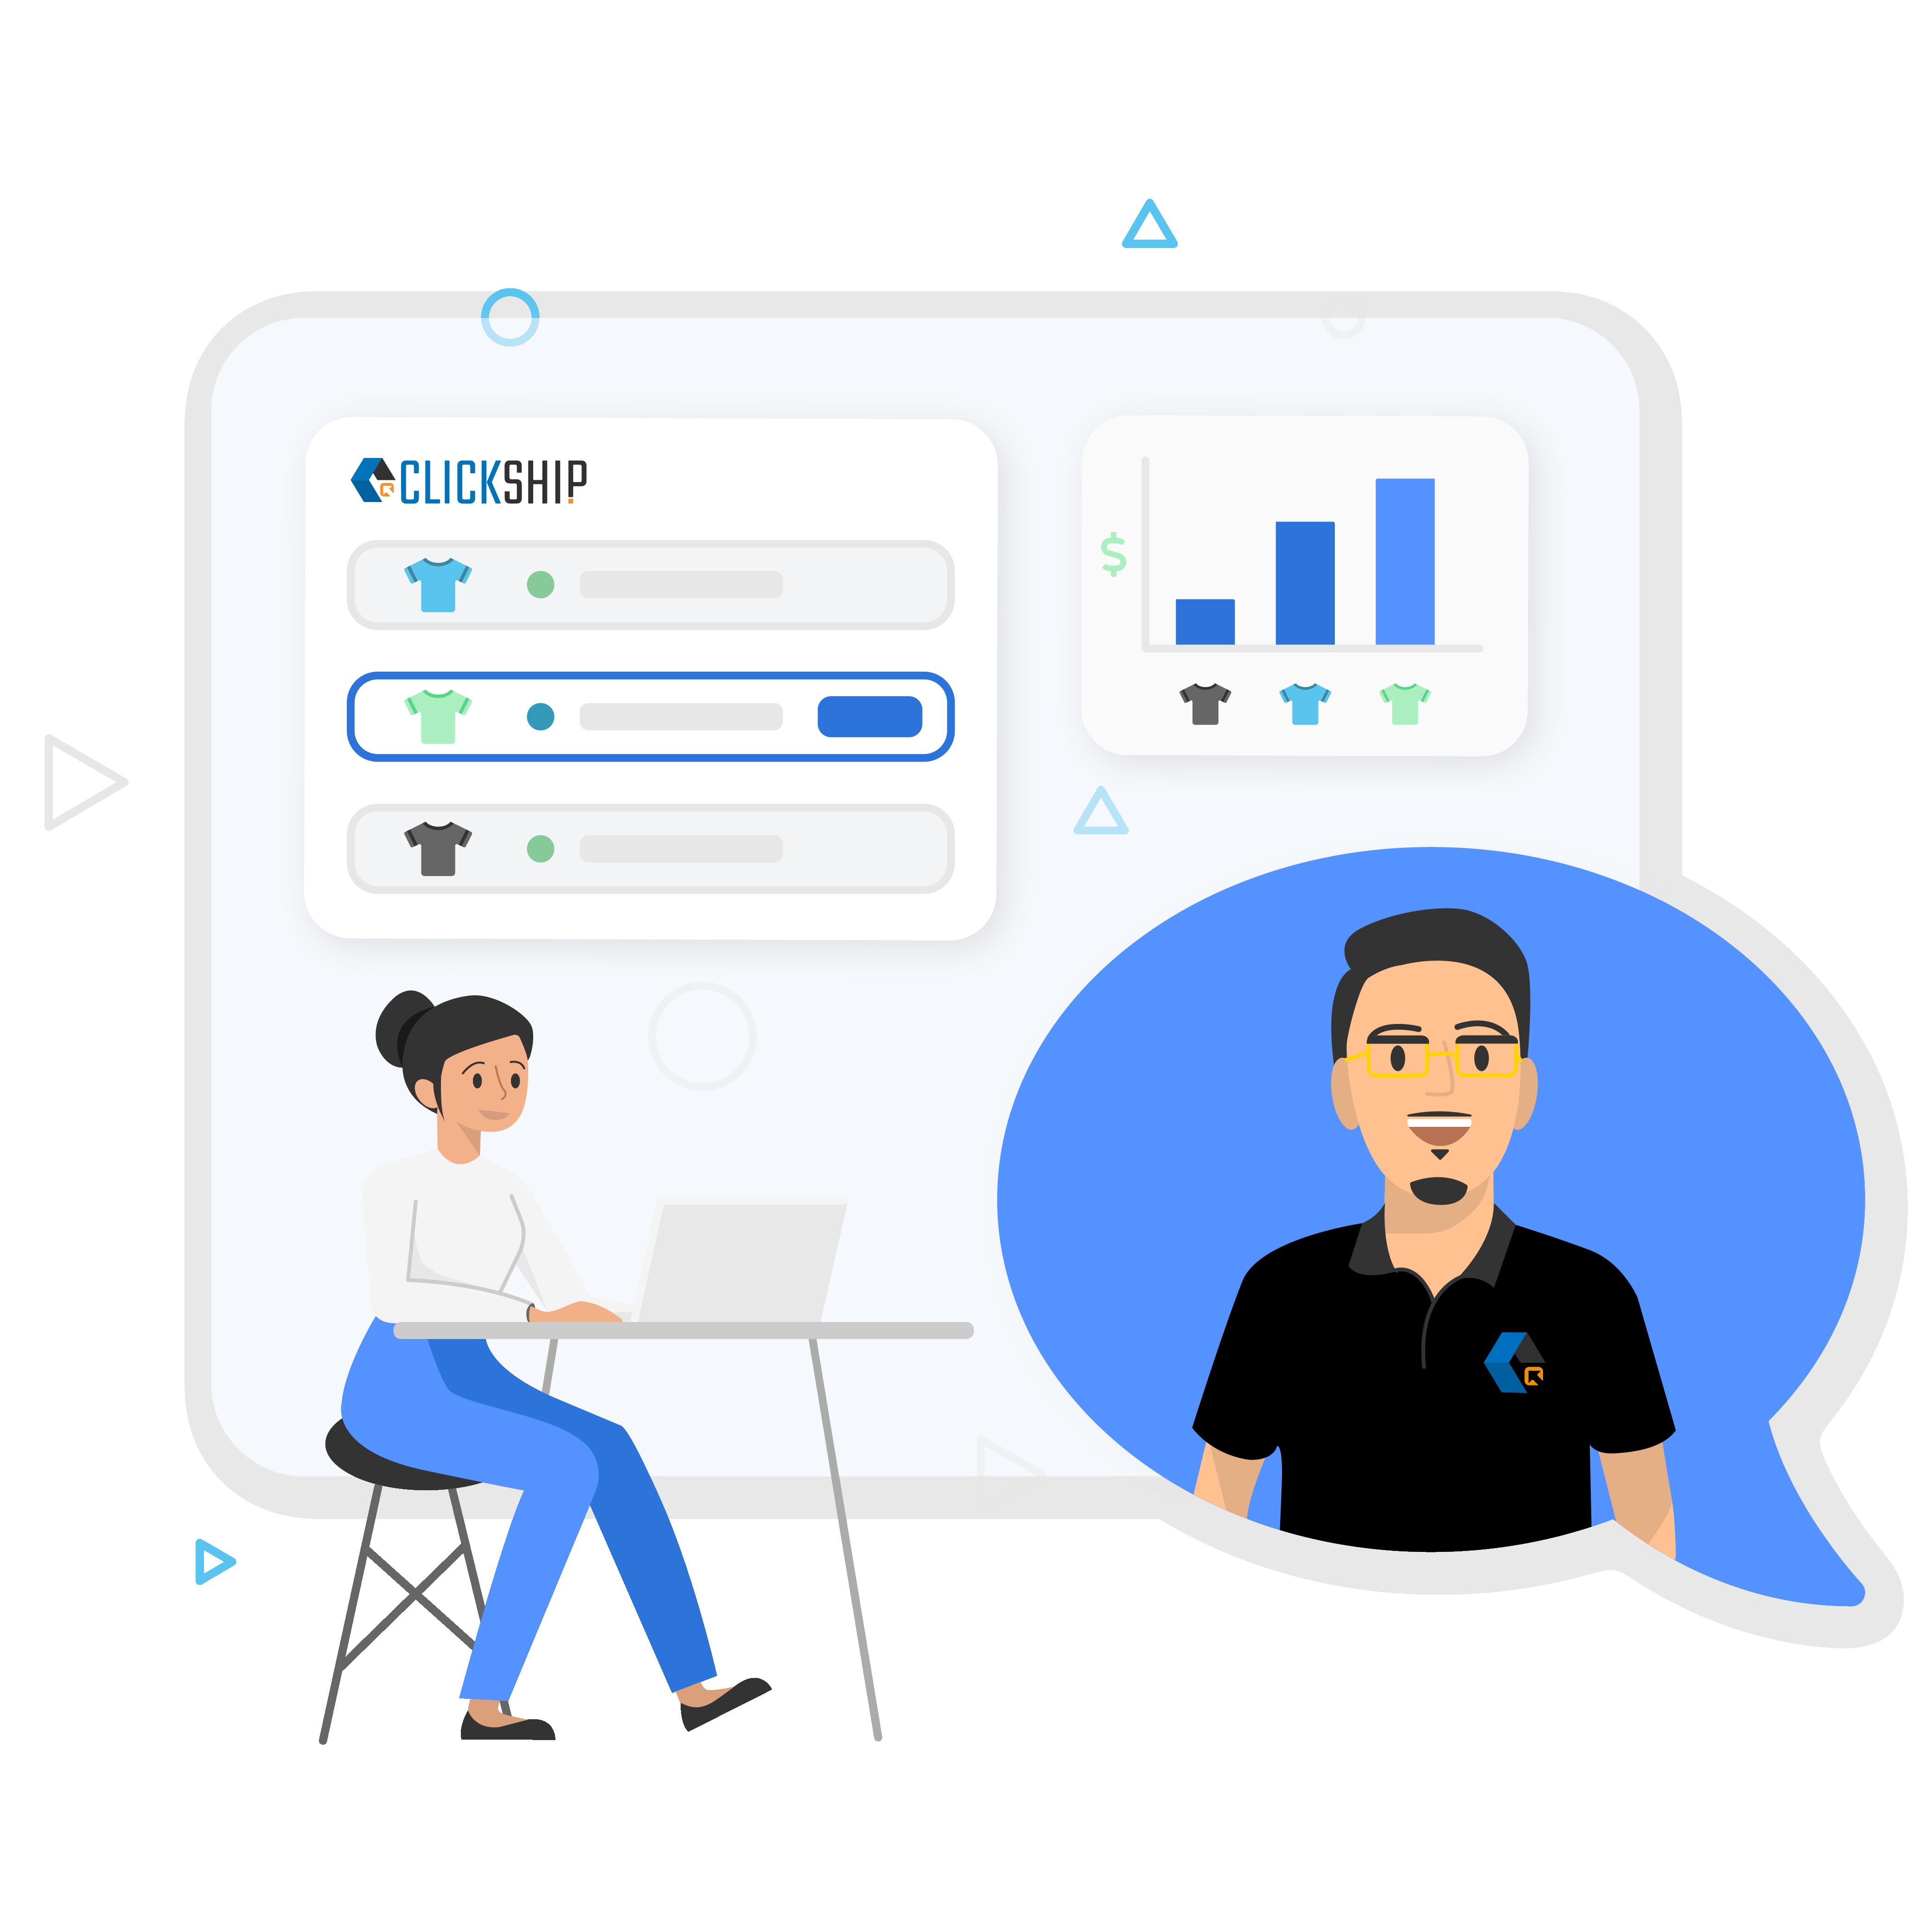 User contacting ClickShip customer service